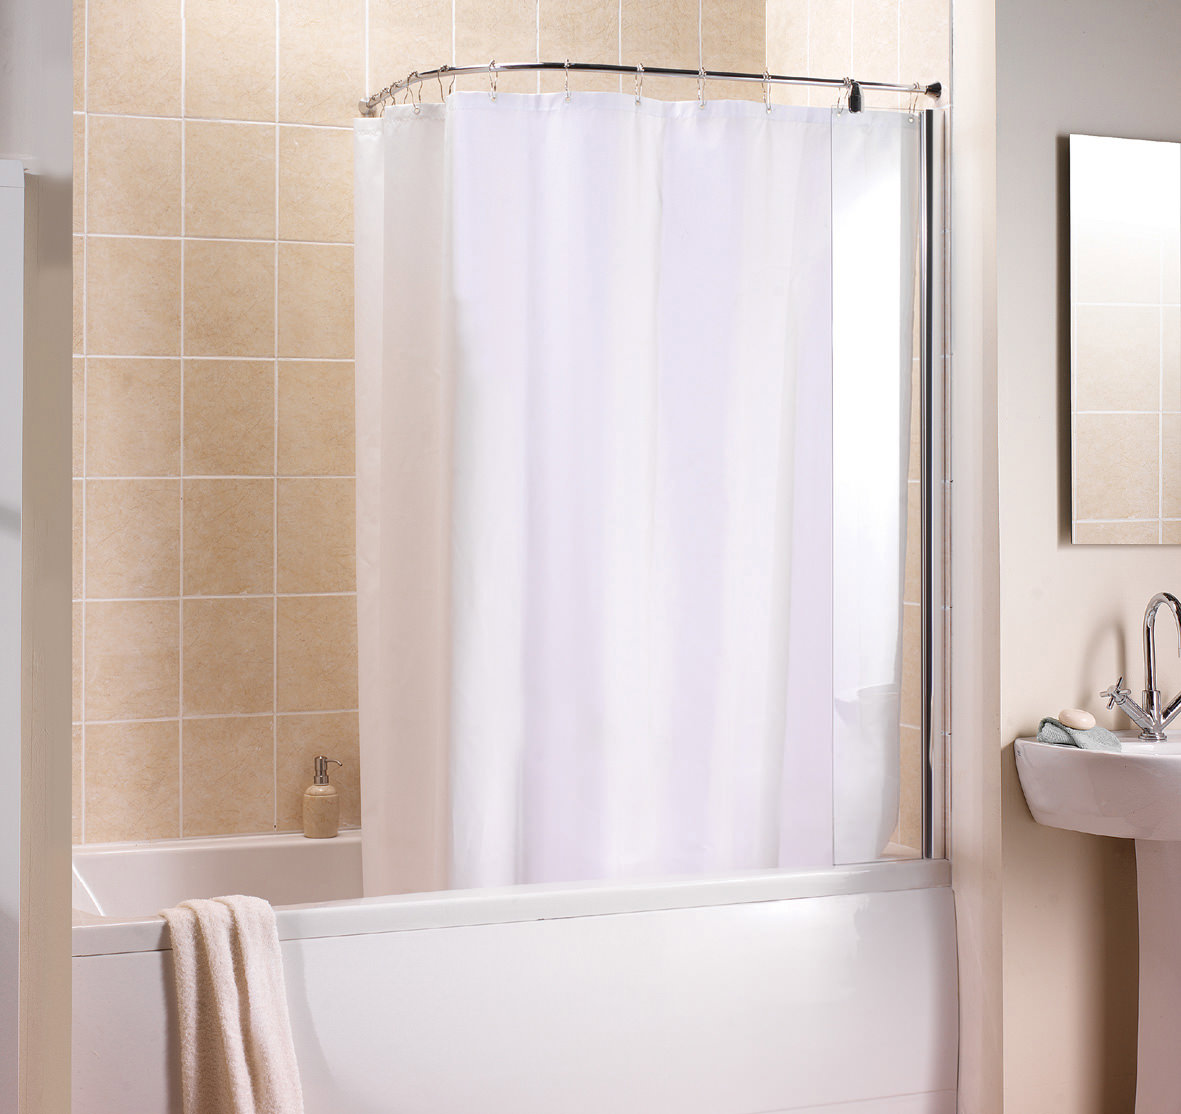 28 shower curtain rails for baths copper pipes shower shower curtain rails for baths manhattan curved shower curtain and rail m3clcscrc